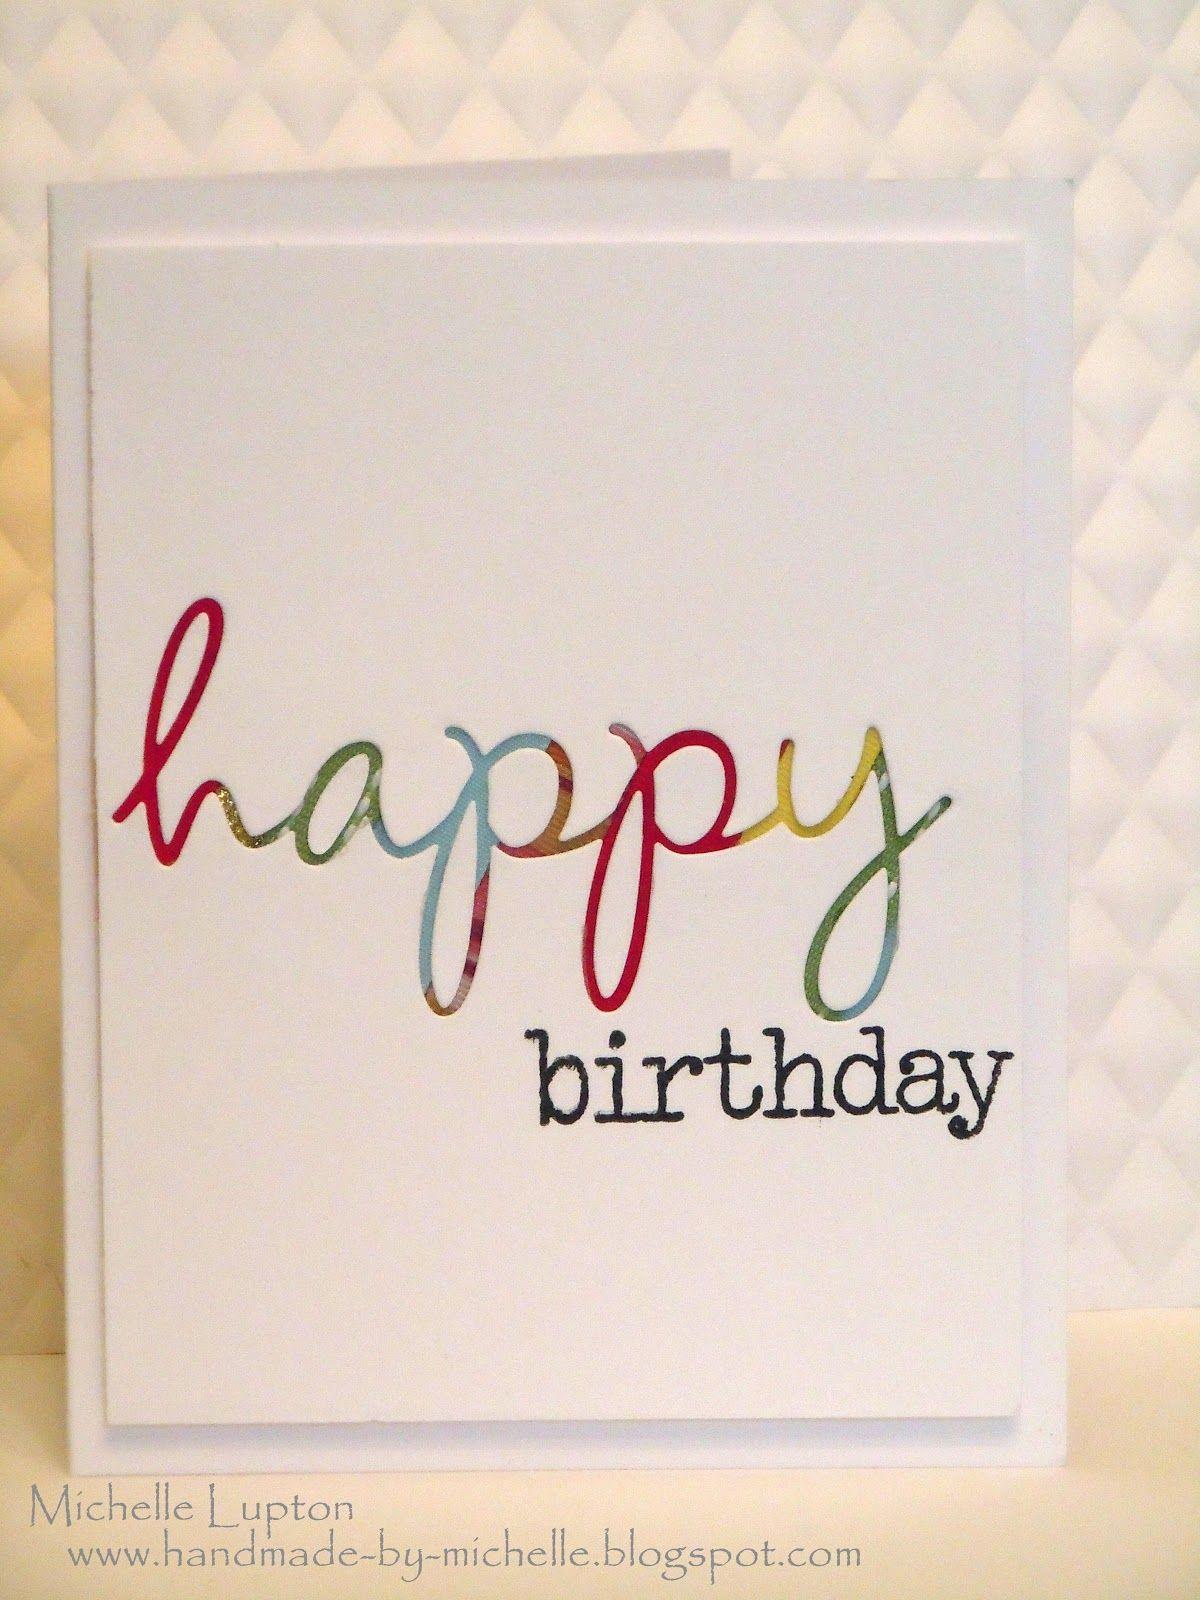 Handmade by Michelle Happy birthday michelle, Card